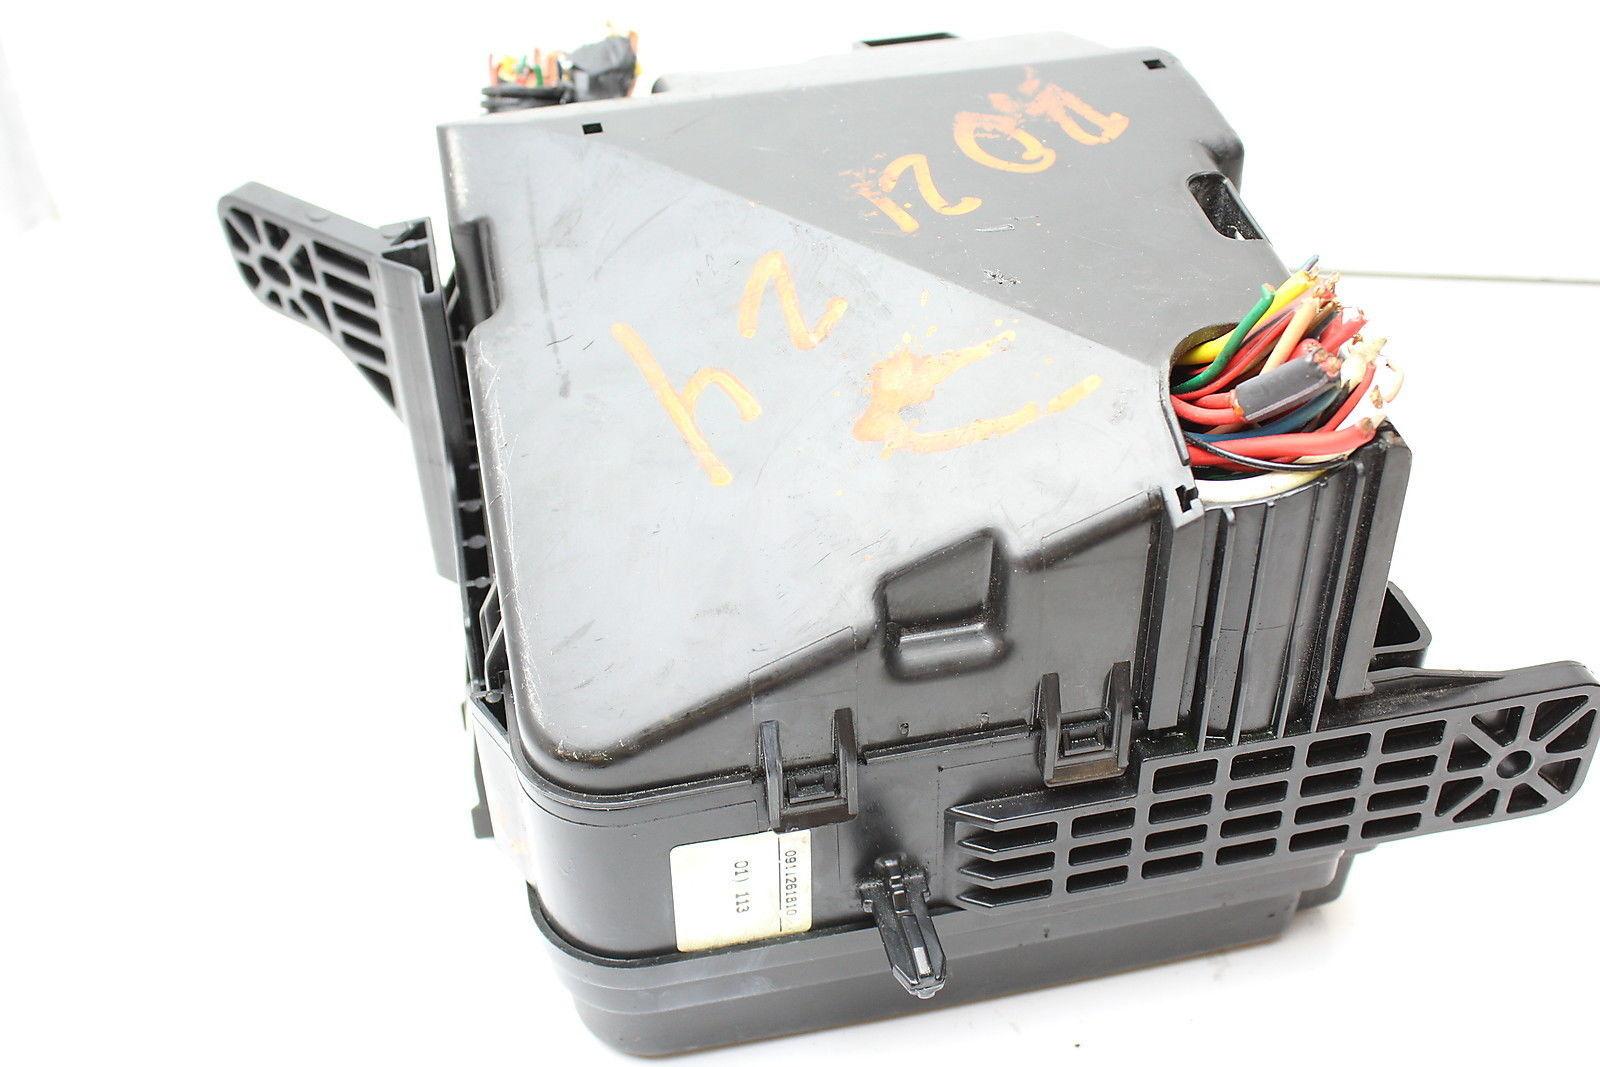 10 11 12 13 Kia Forte 91941 1m020 Fusebox And 26 Similar Items Fuse Box 2011 Relay Unit Module K9968